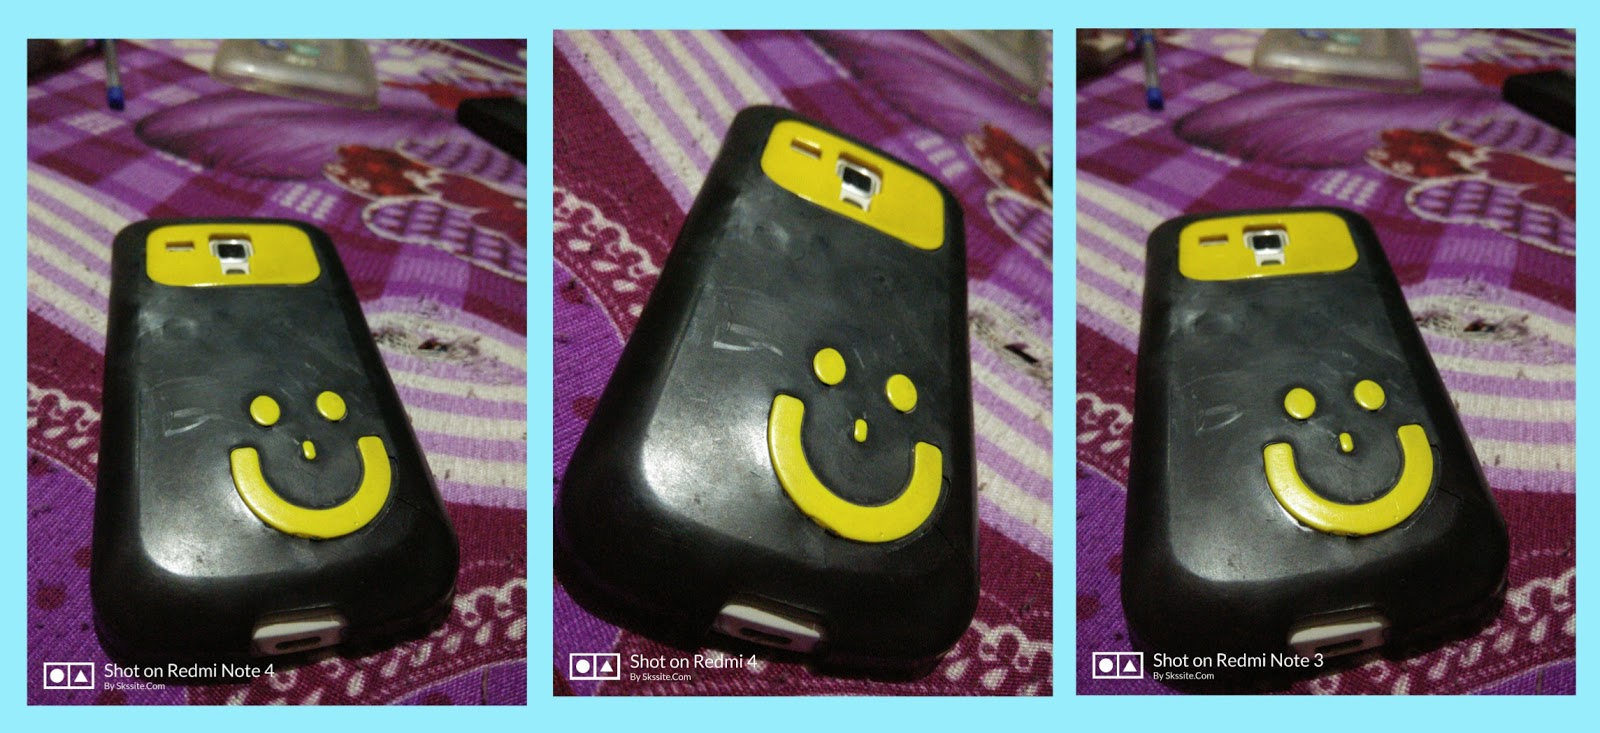 Shot On Redmi Note 4/4X, Redmi Note 3,Redmi 4/4X/4A, Mi Max